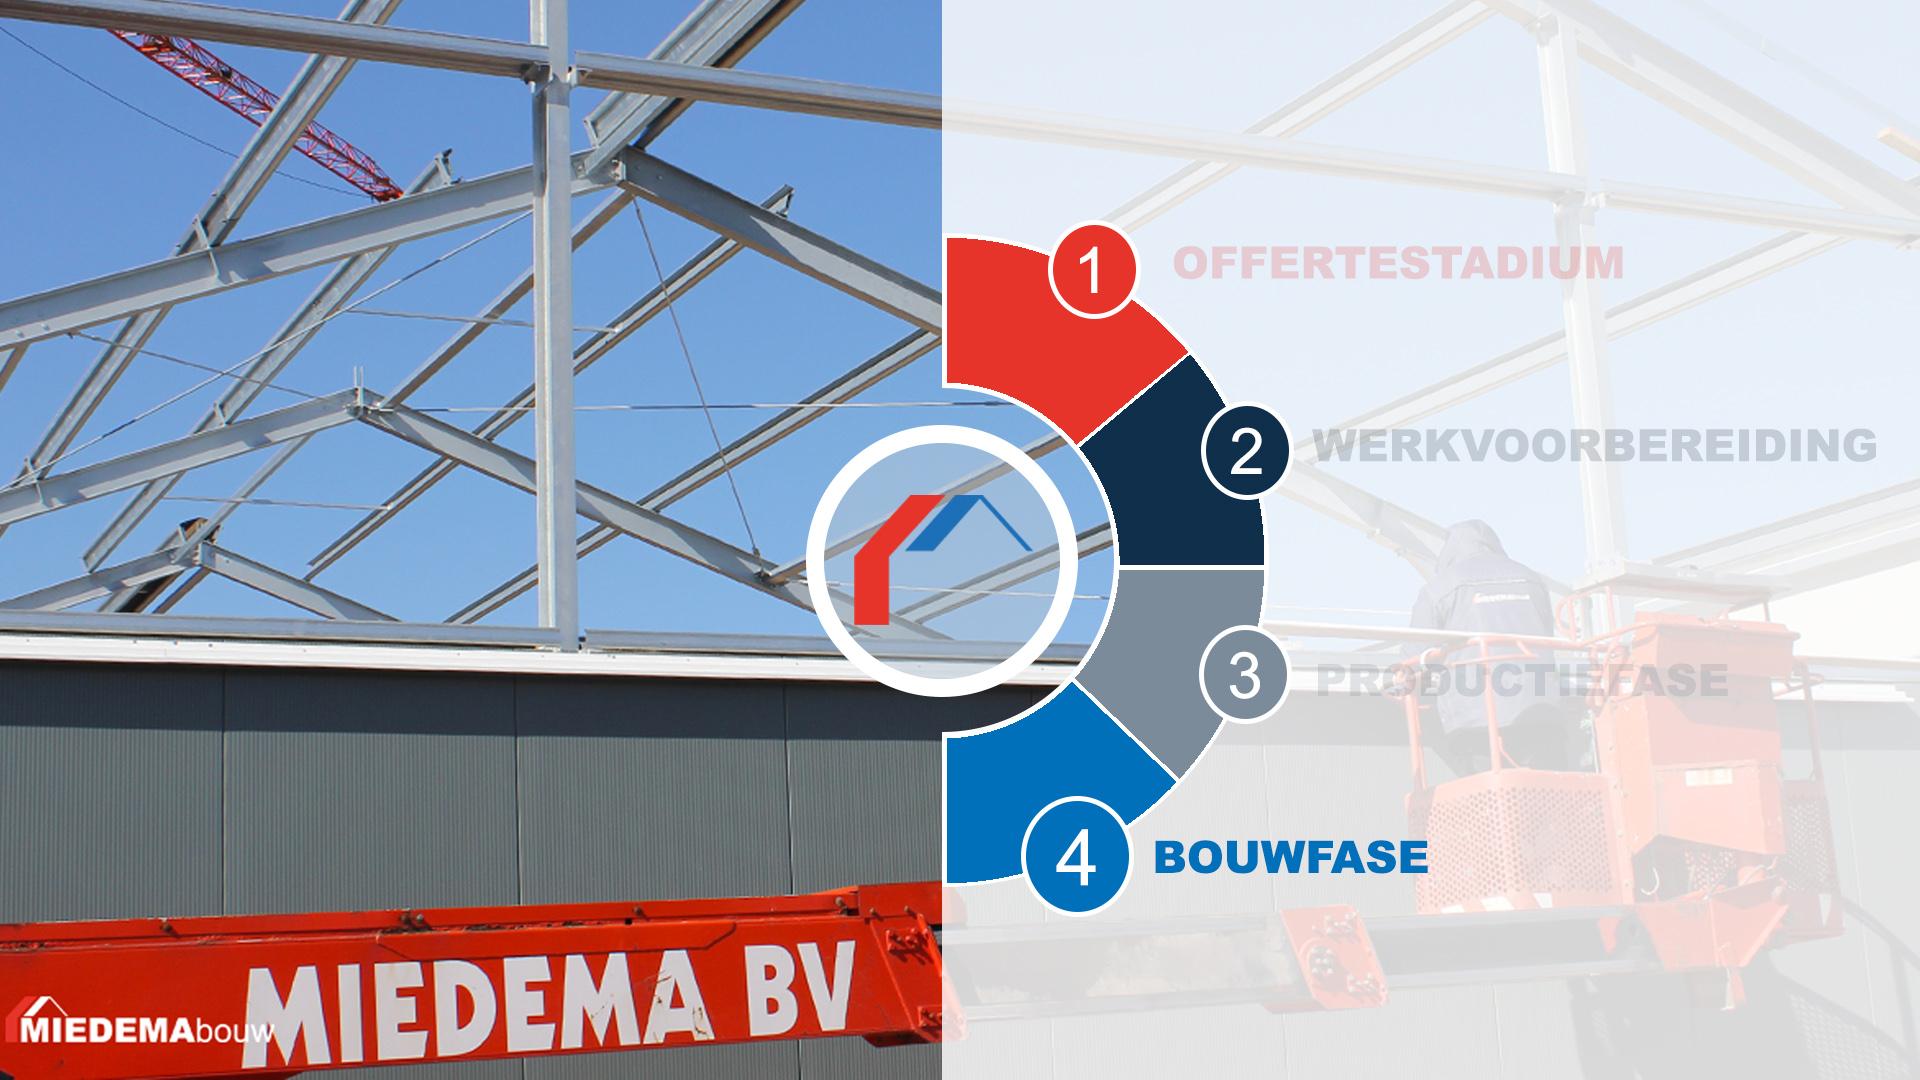 Werkwijze bouwbedrijf MIEDEMAbouw stap 4 bouwfase